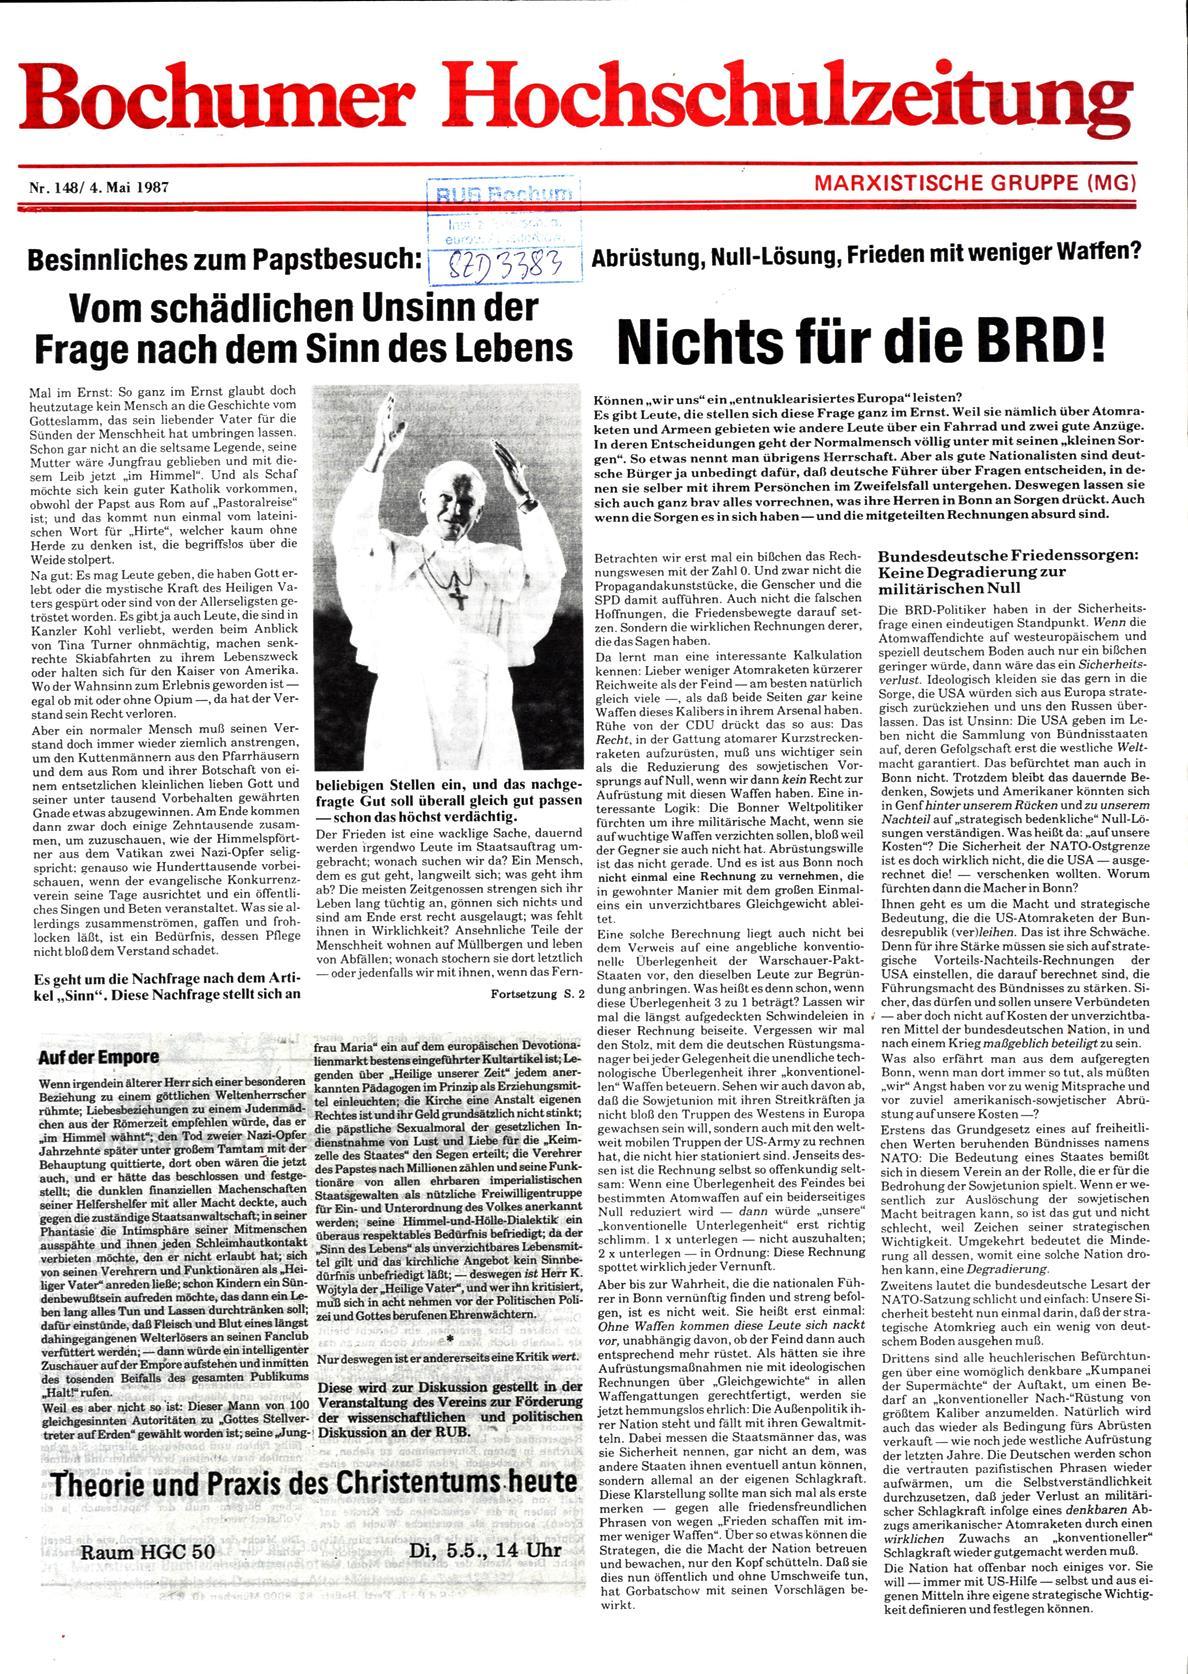 Bochum_BHZ_19870504_148_001